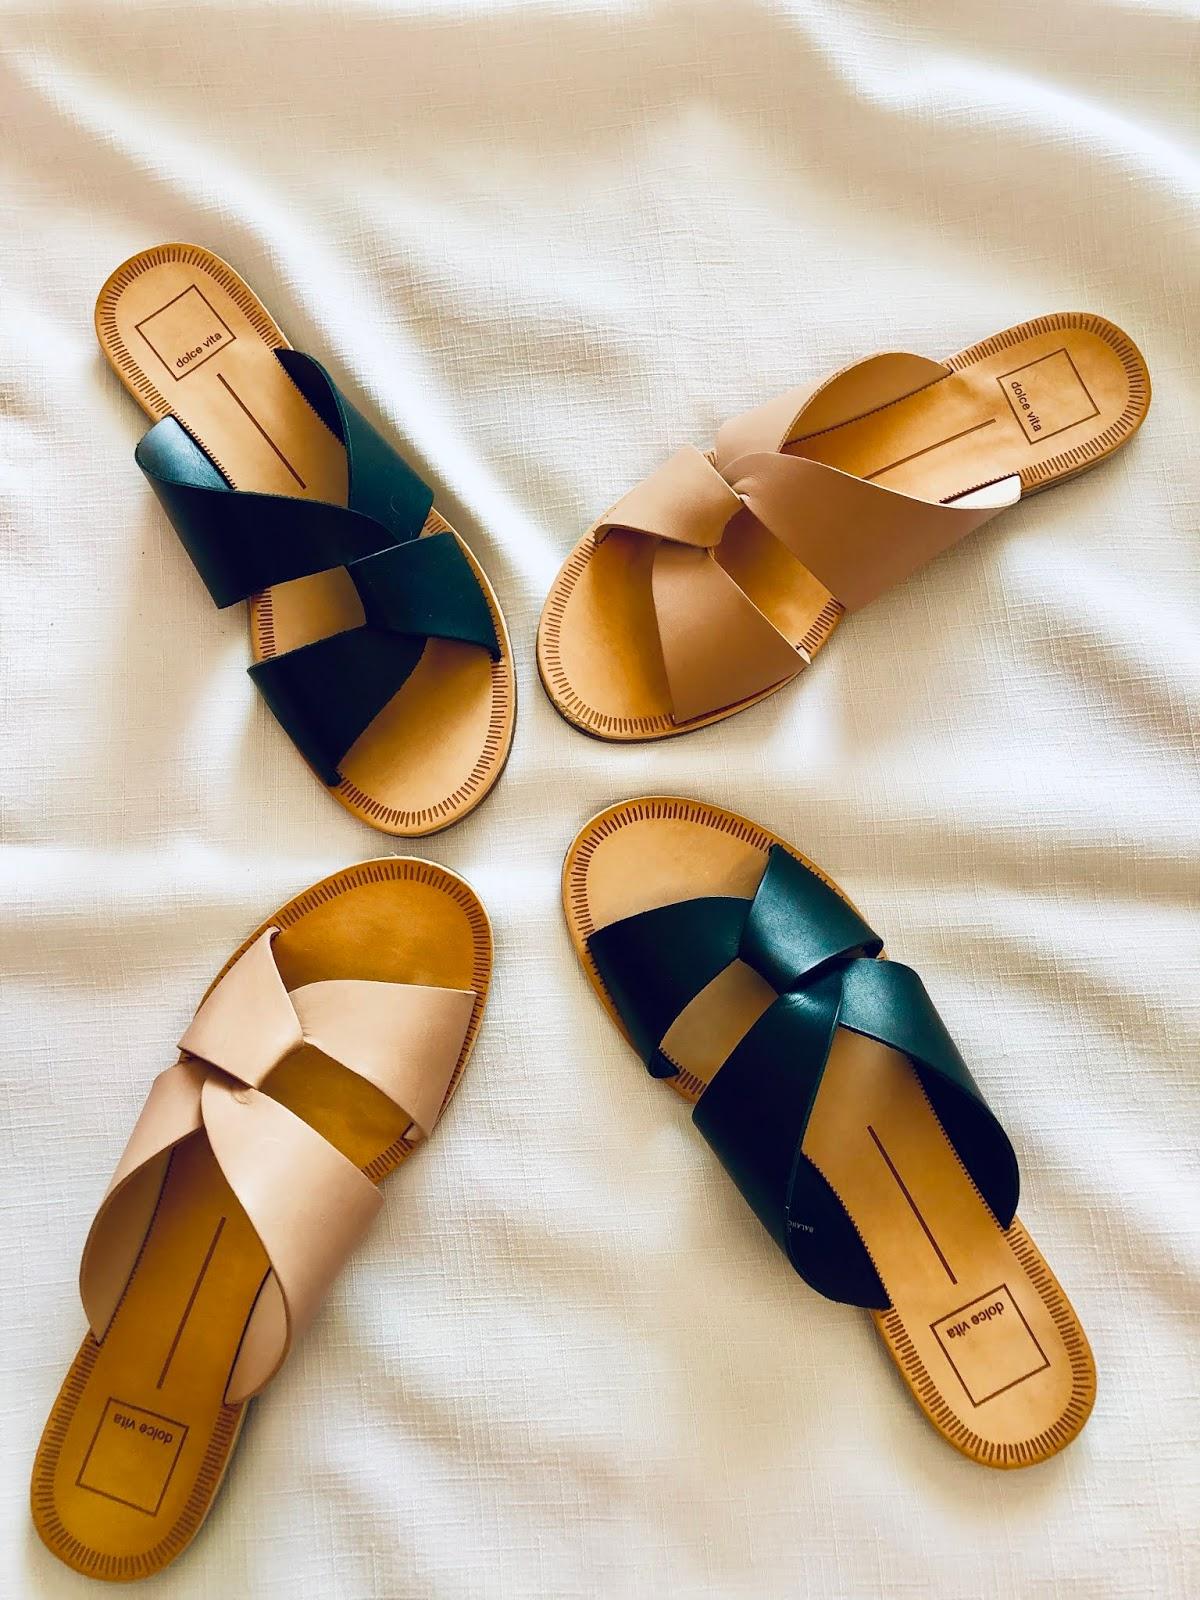 black sandals, dolce vita derby sandals, dolce vita haul, dolce vita shoes, dsw, dsw shoe haul, pink sandals, sandals, what to wear for summer,